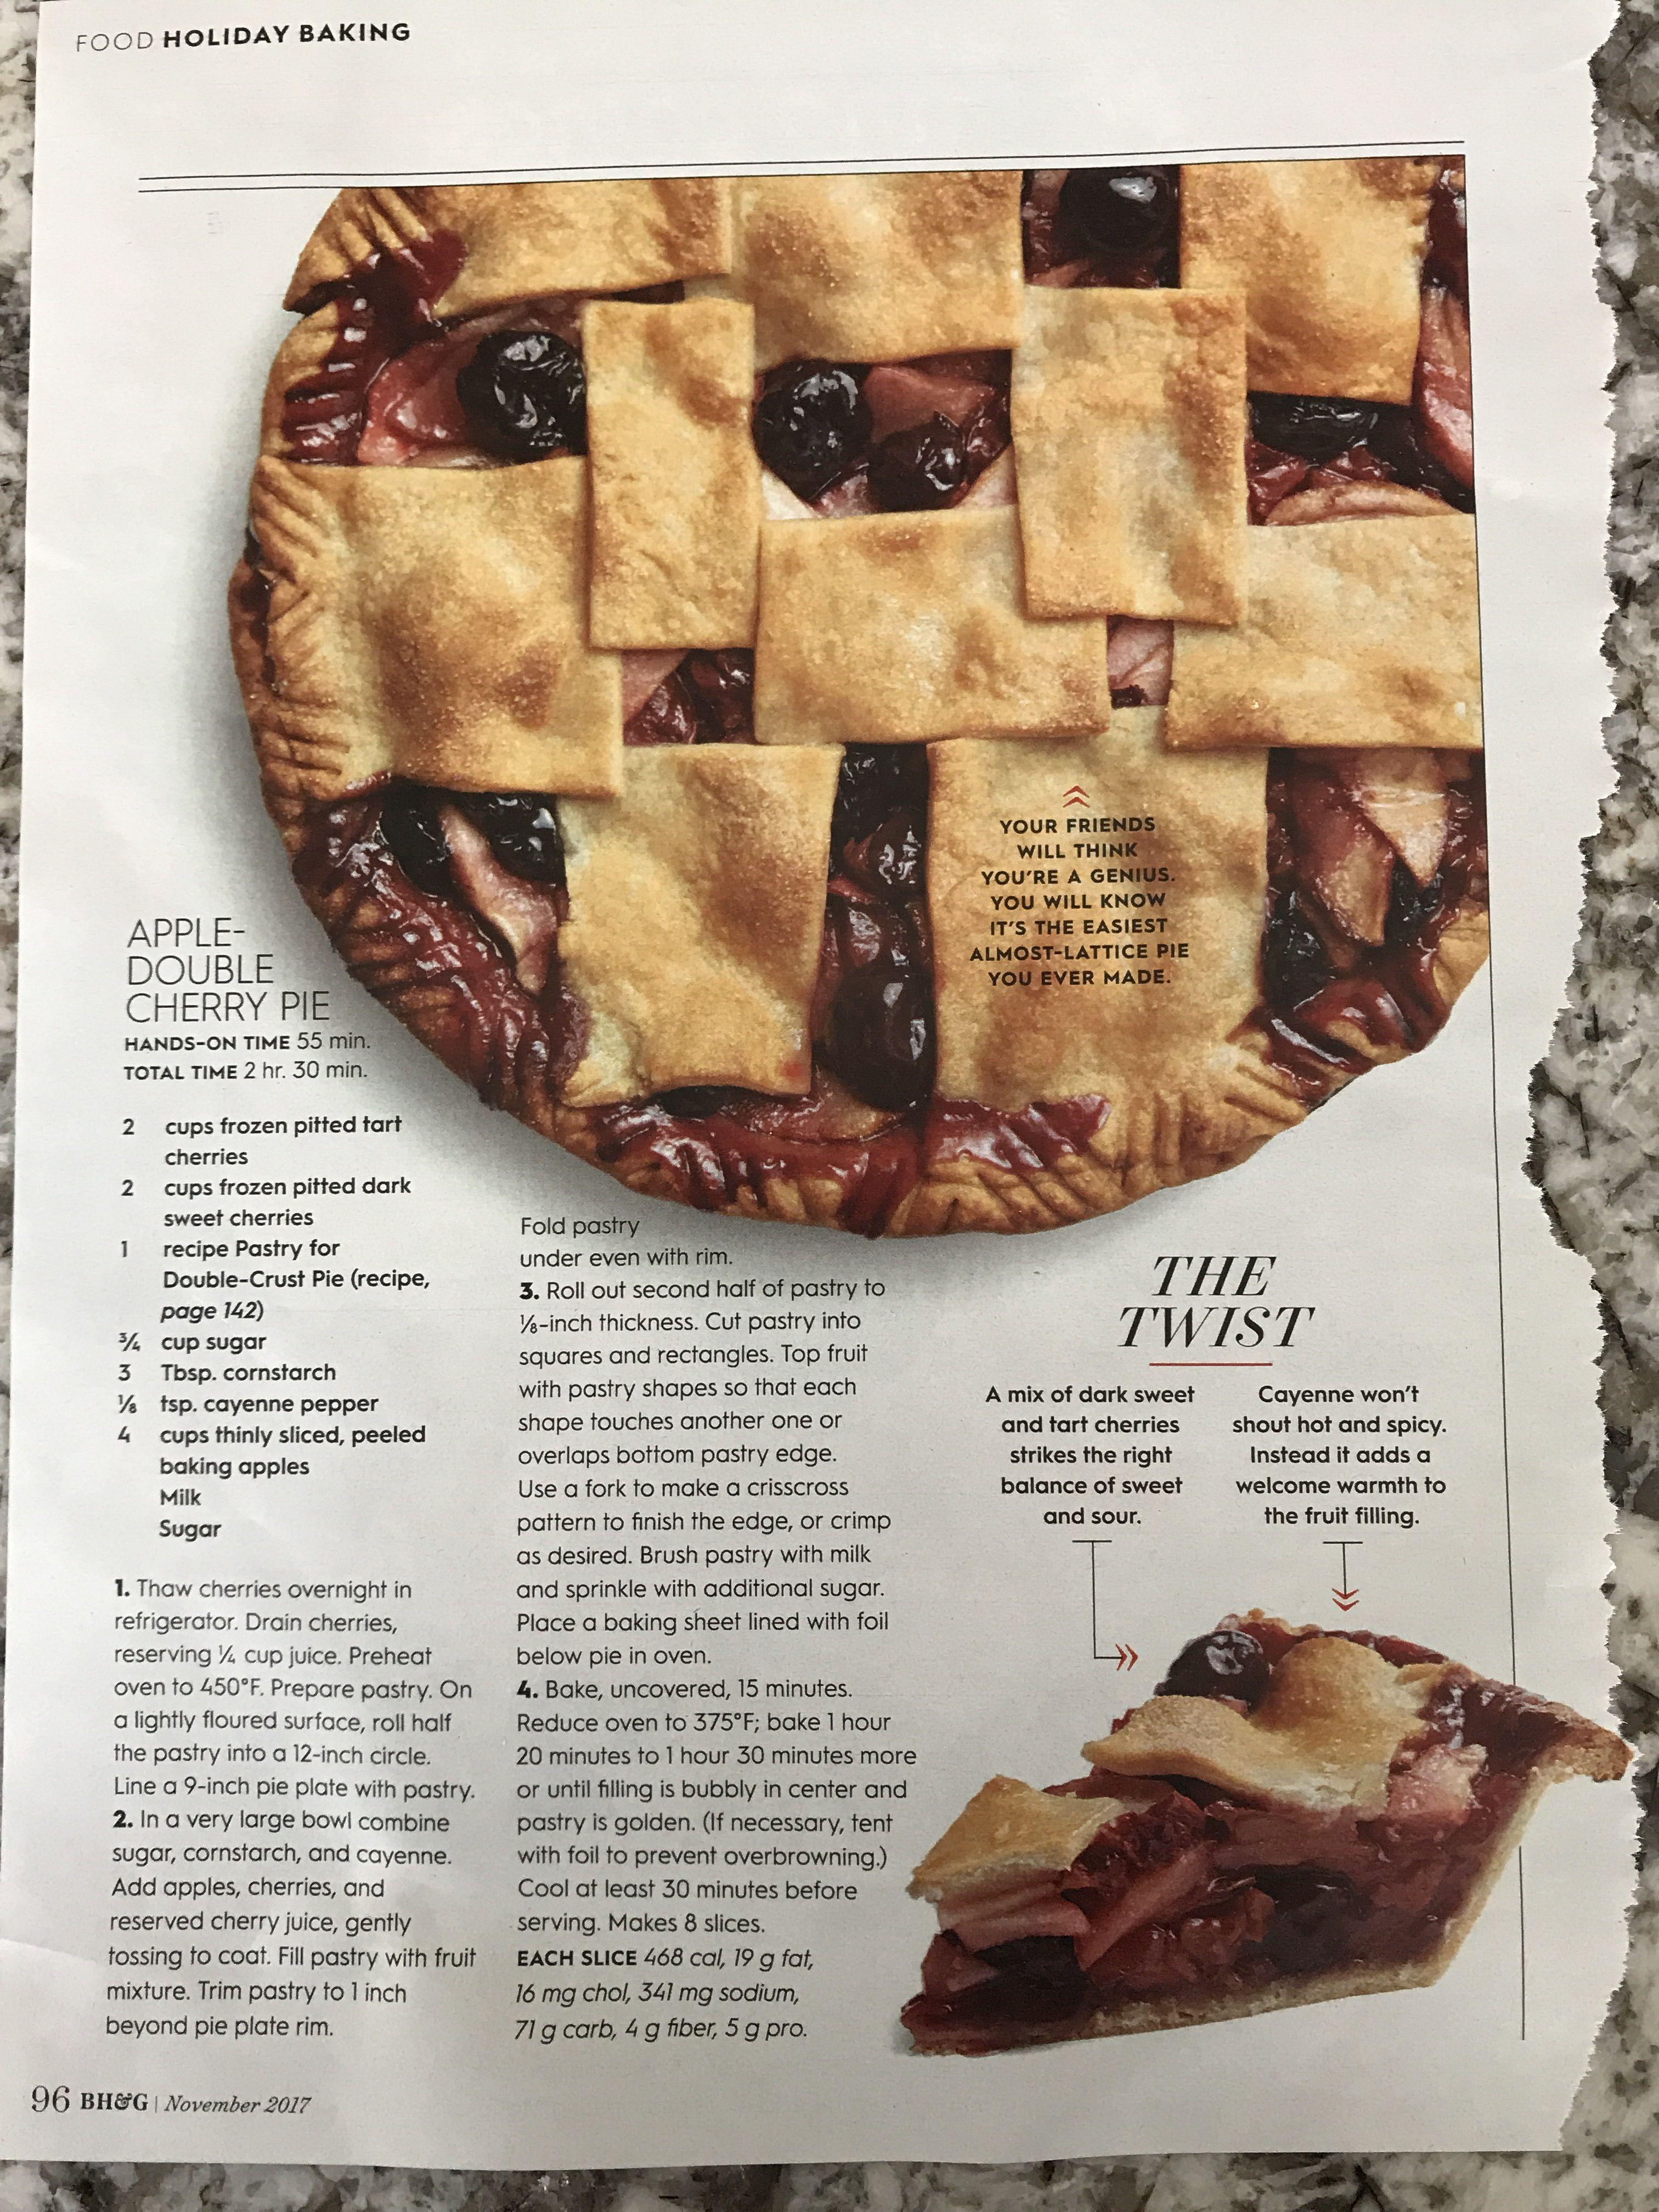 c23258b314e1170c5491a88262f4cece - Better Homes And Gardens Pie Pastry Recipe